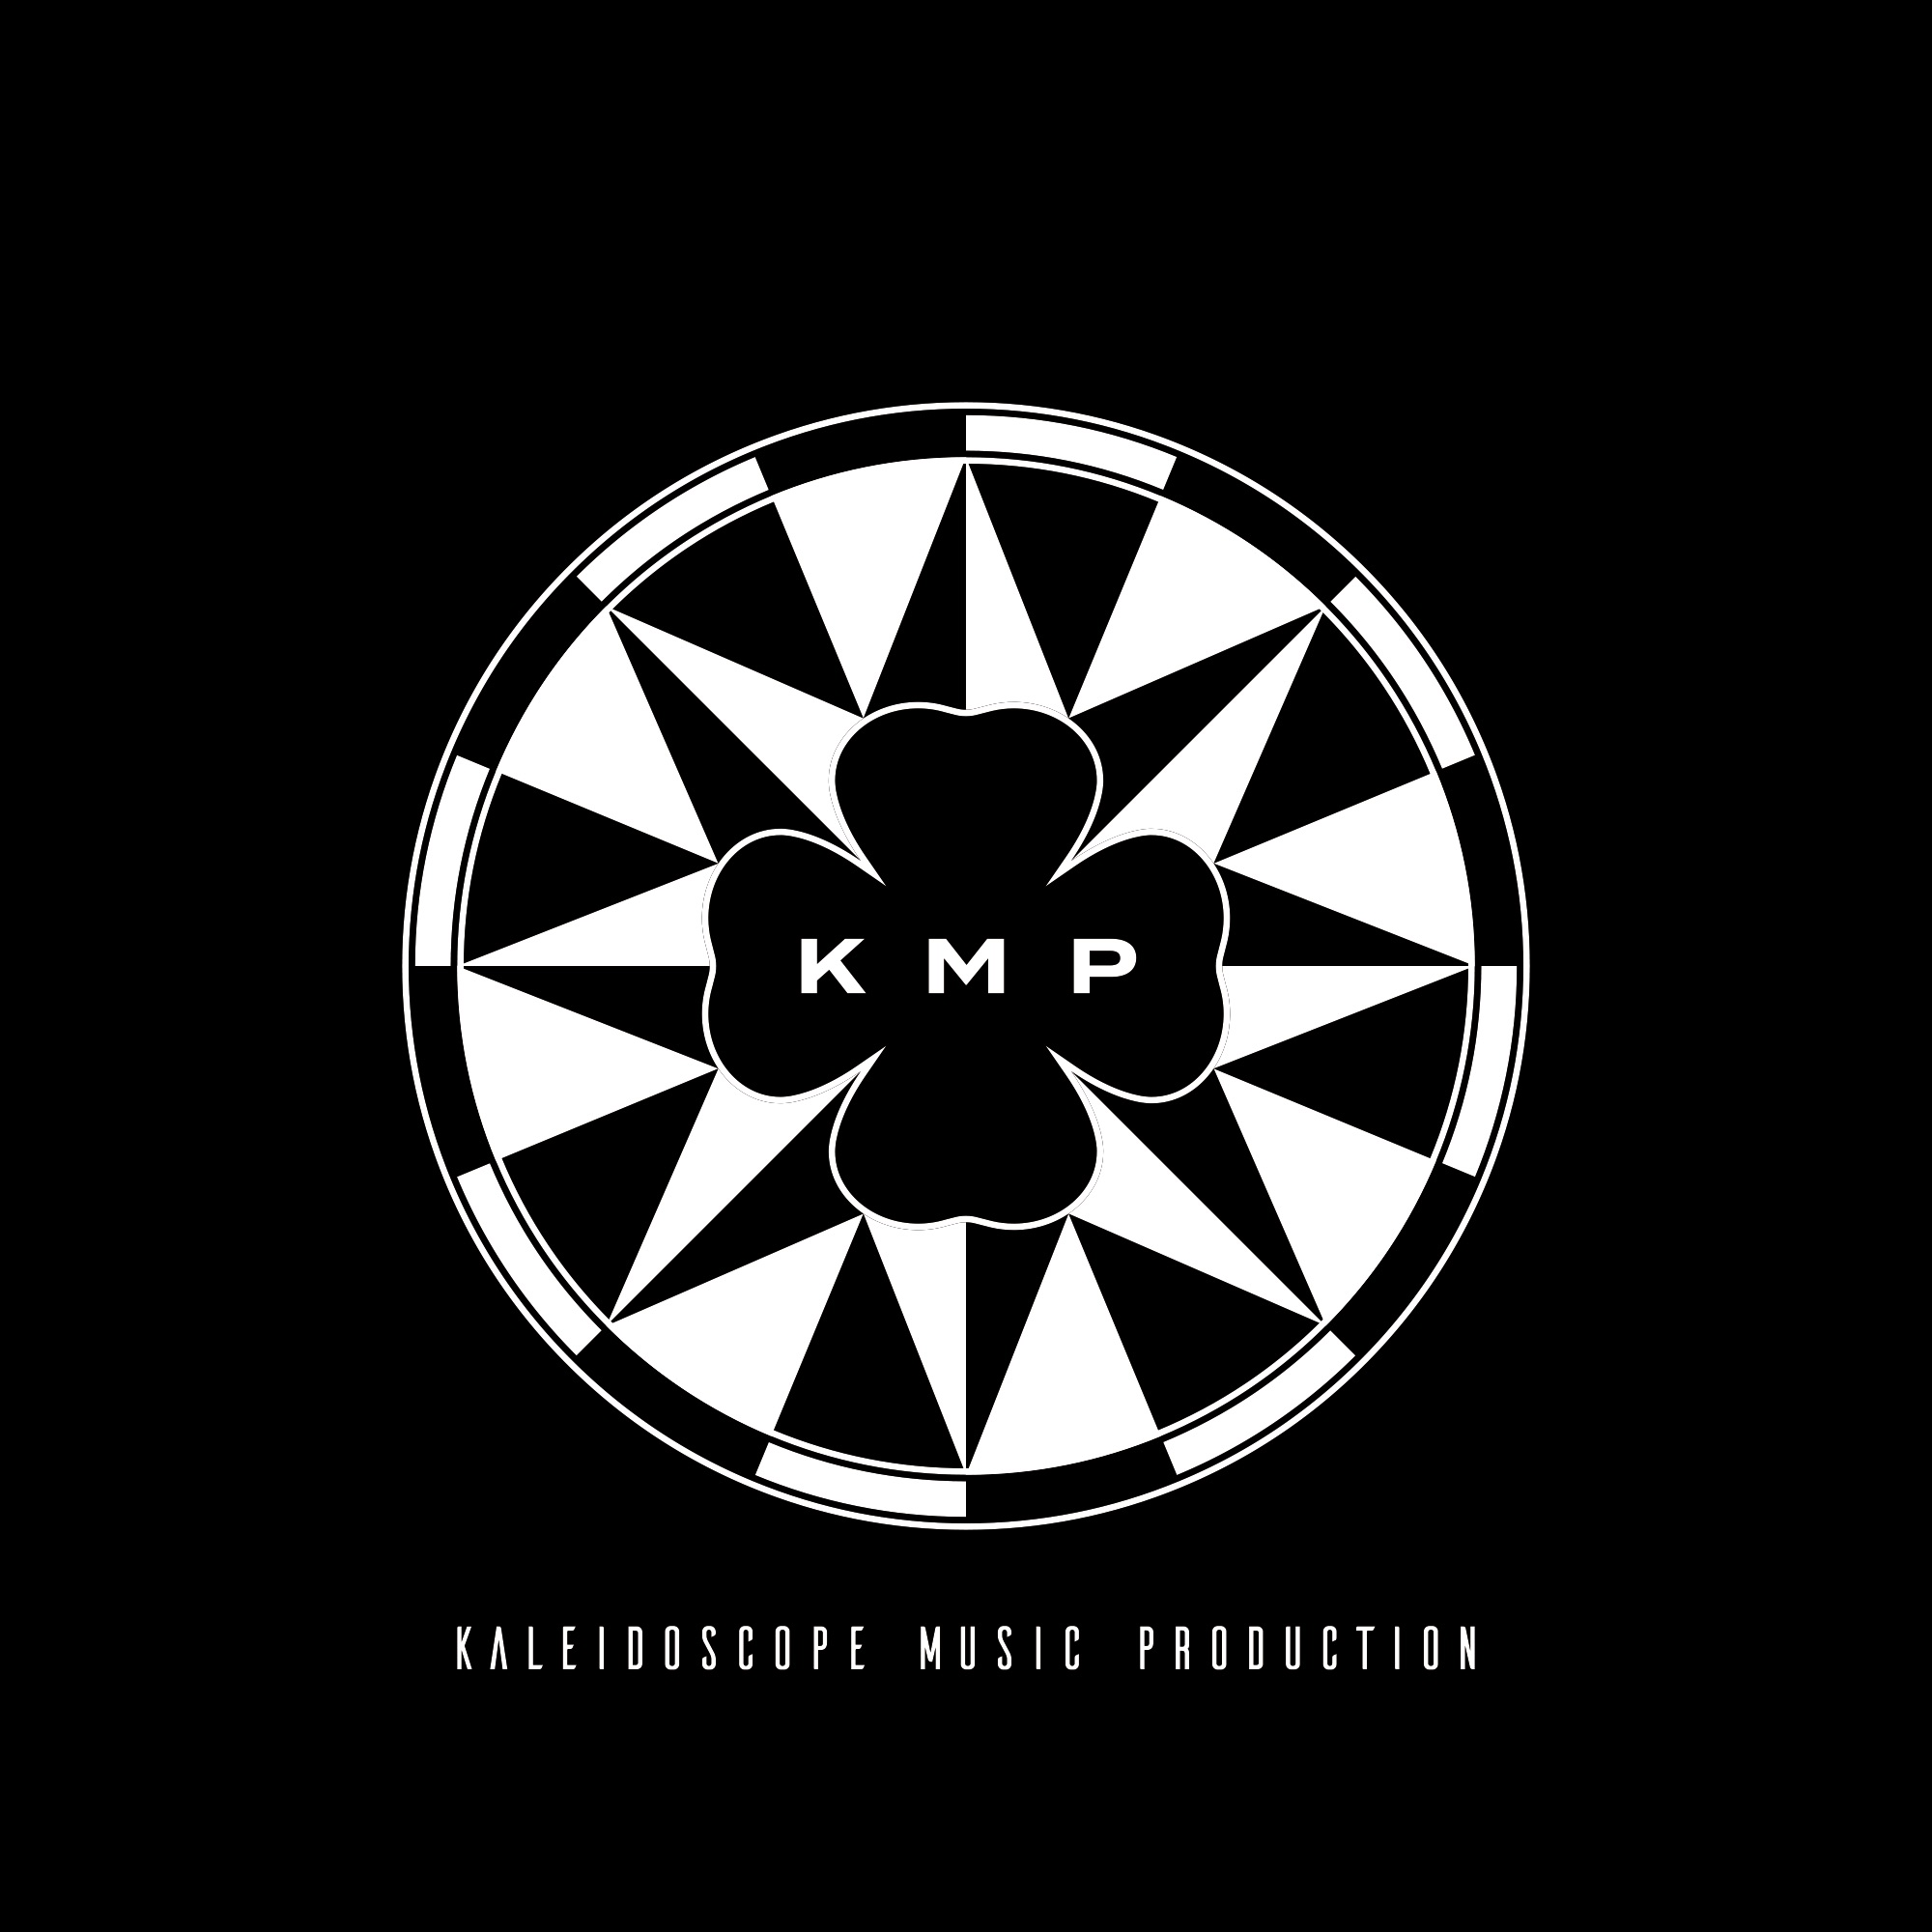 KALEIDOSCOPE MUSIC PRODUCTION